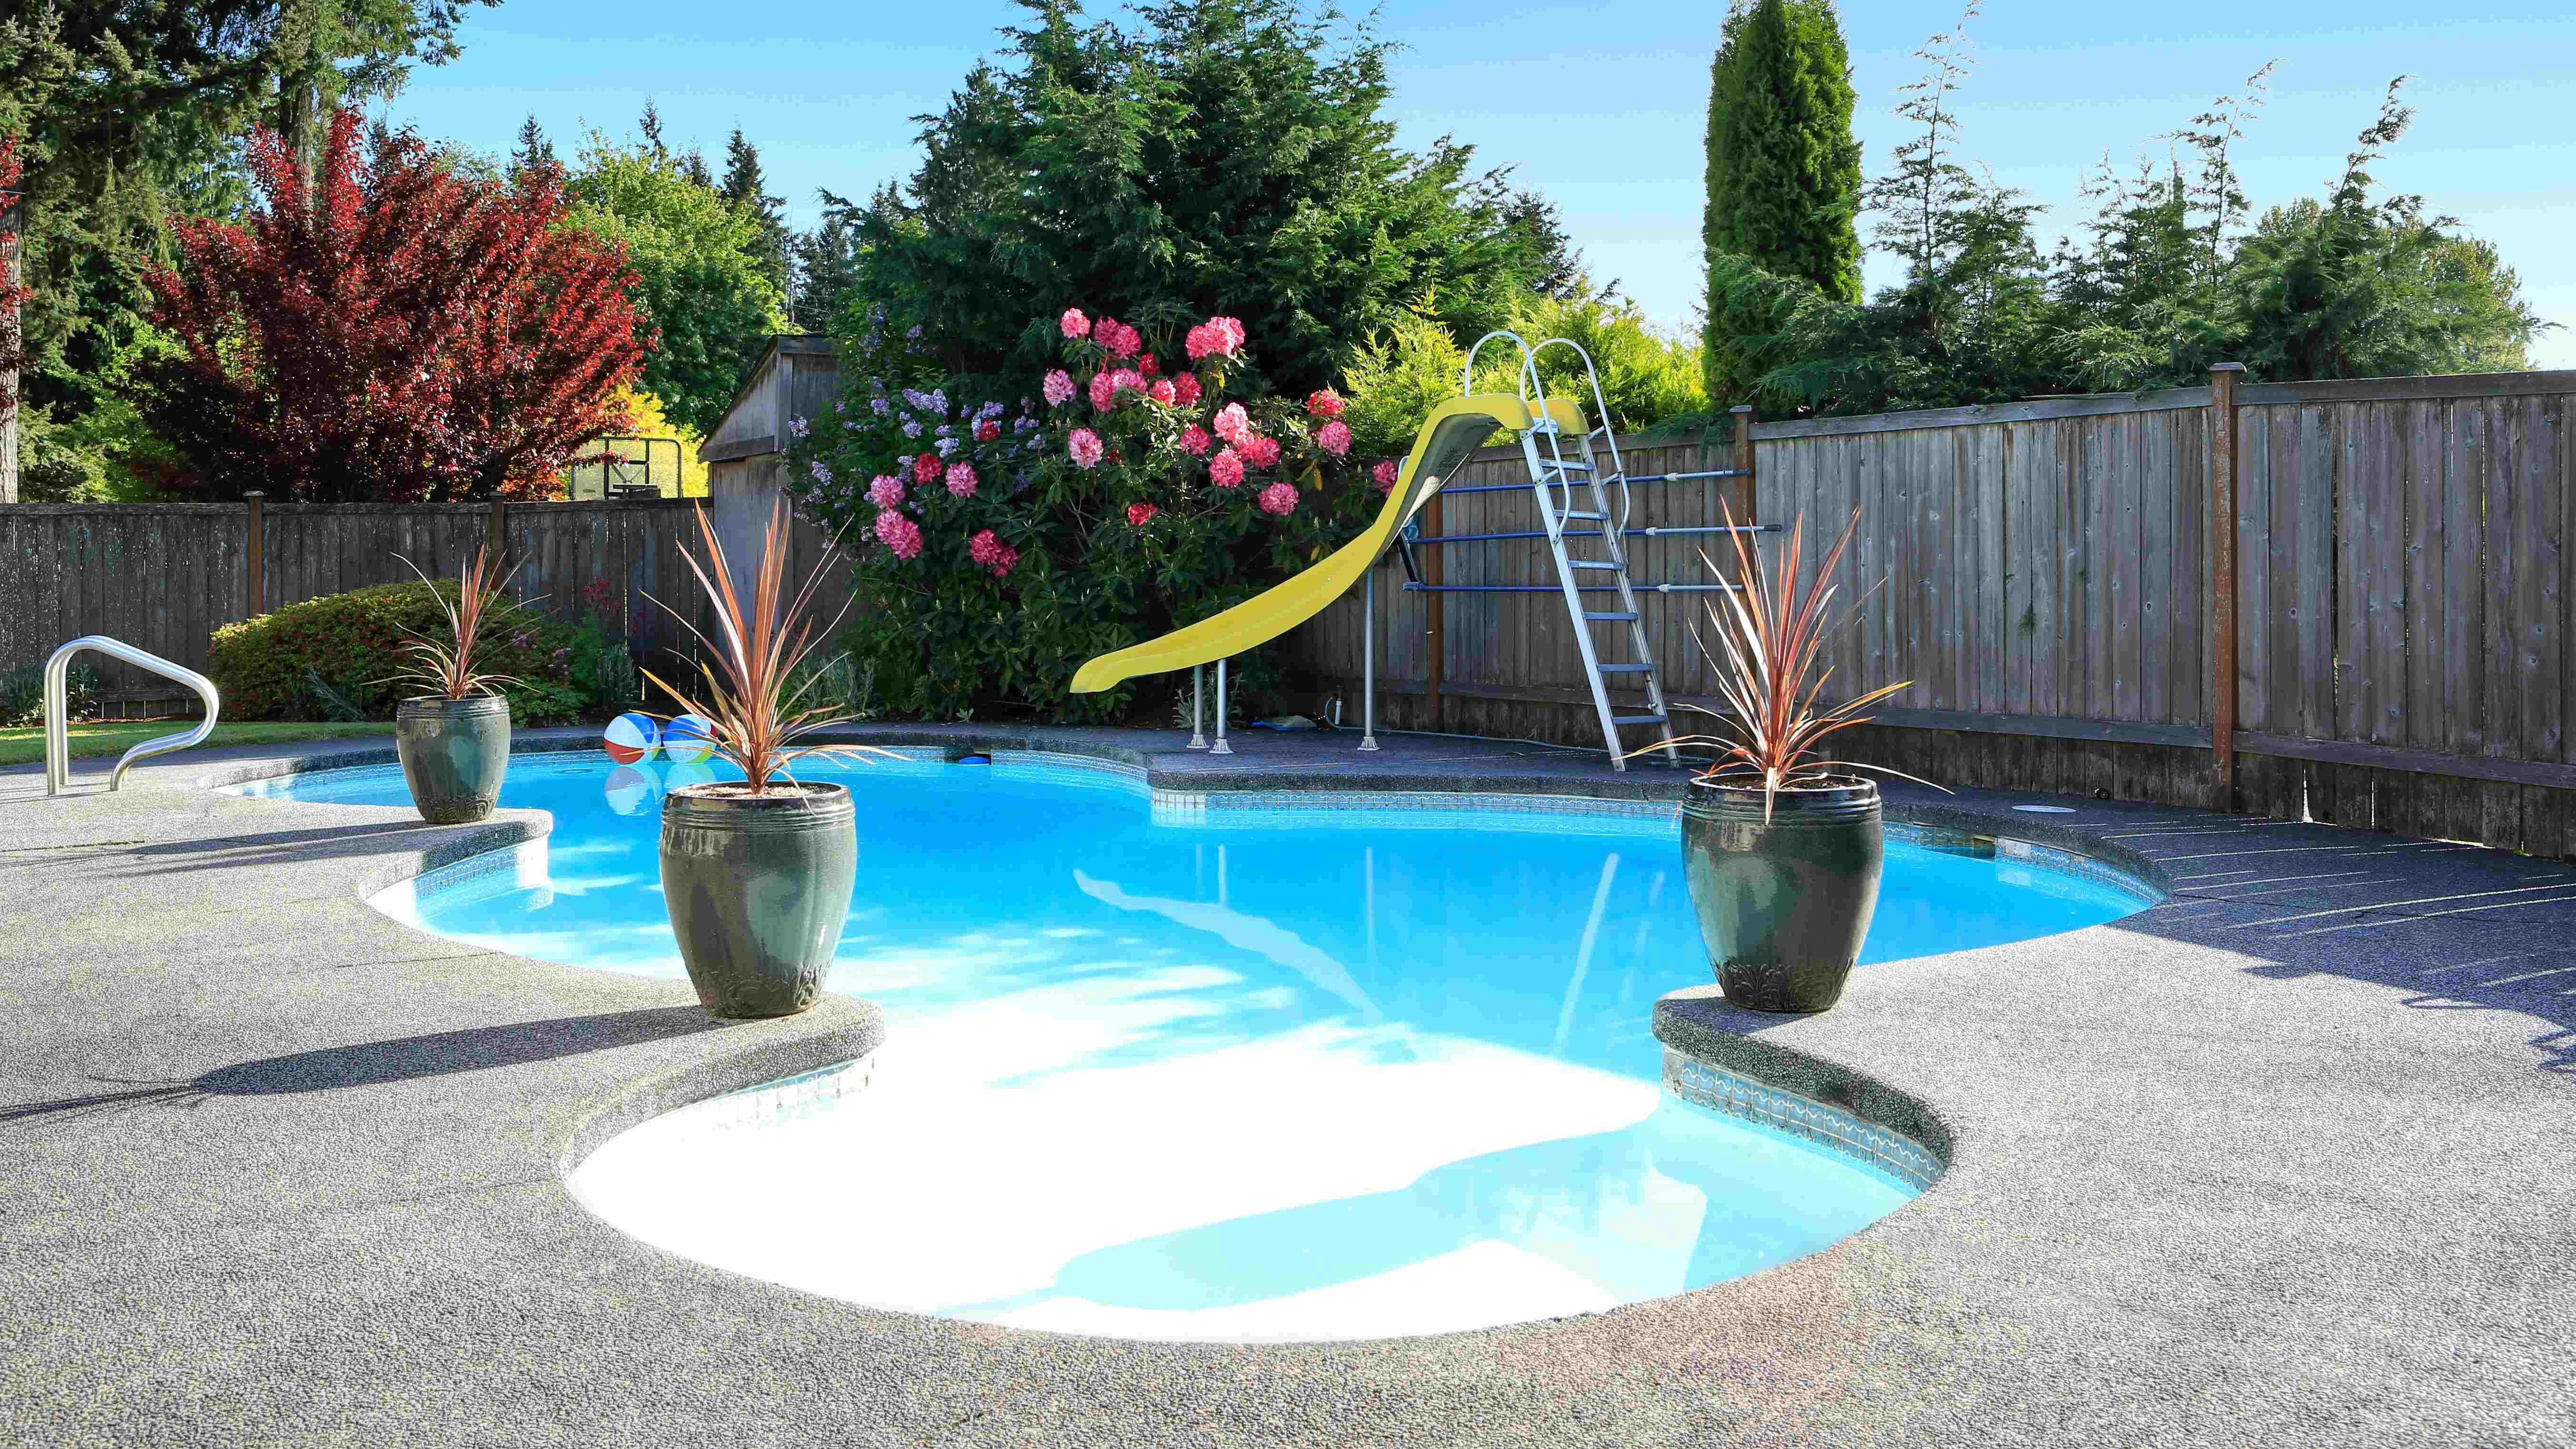 Cómo elegir una piscina